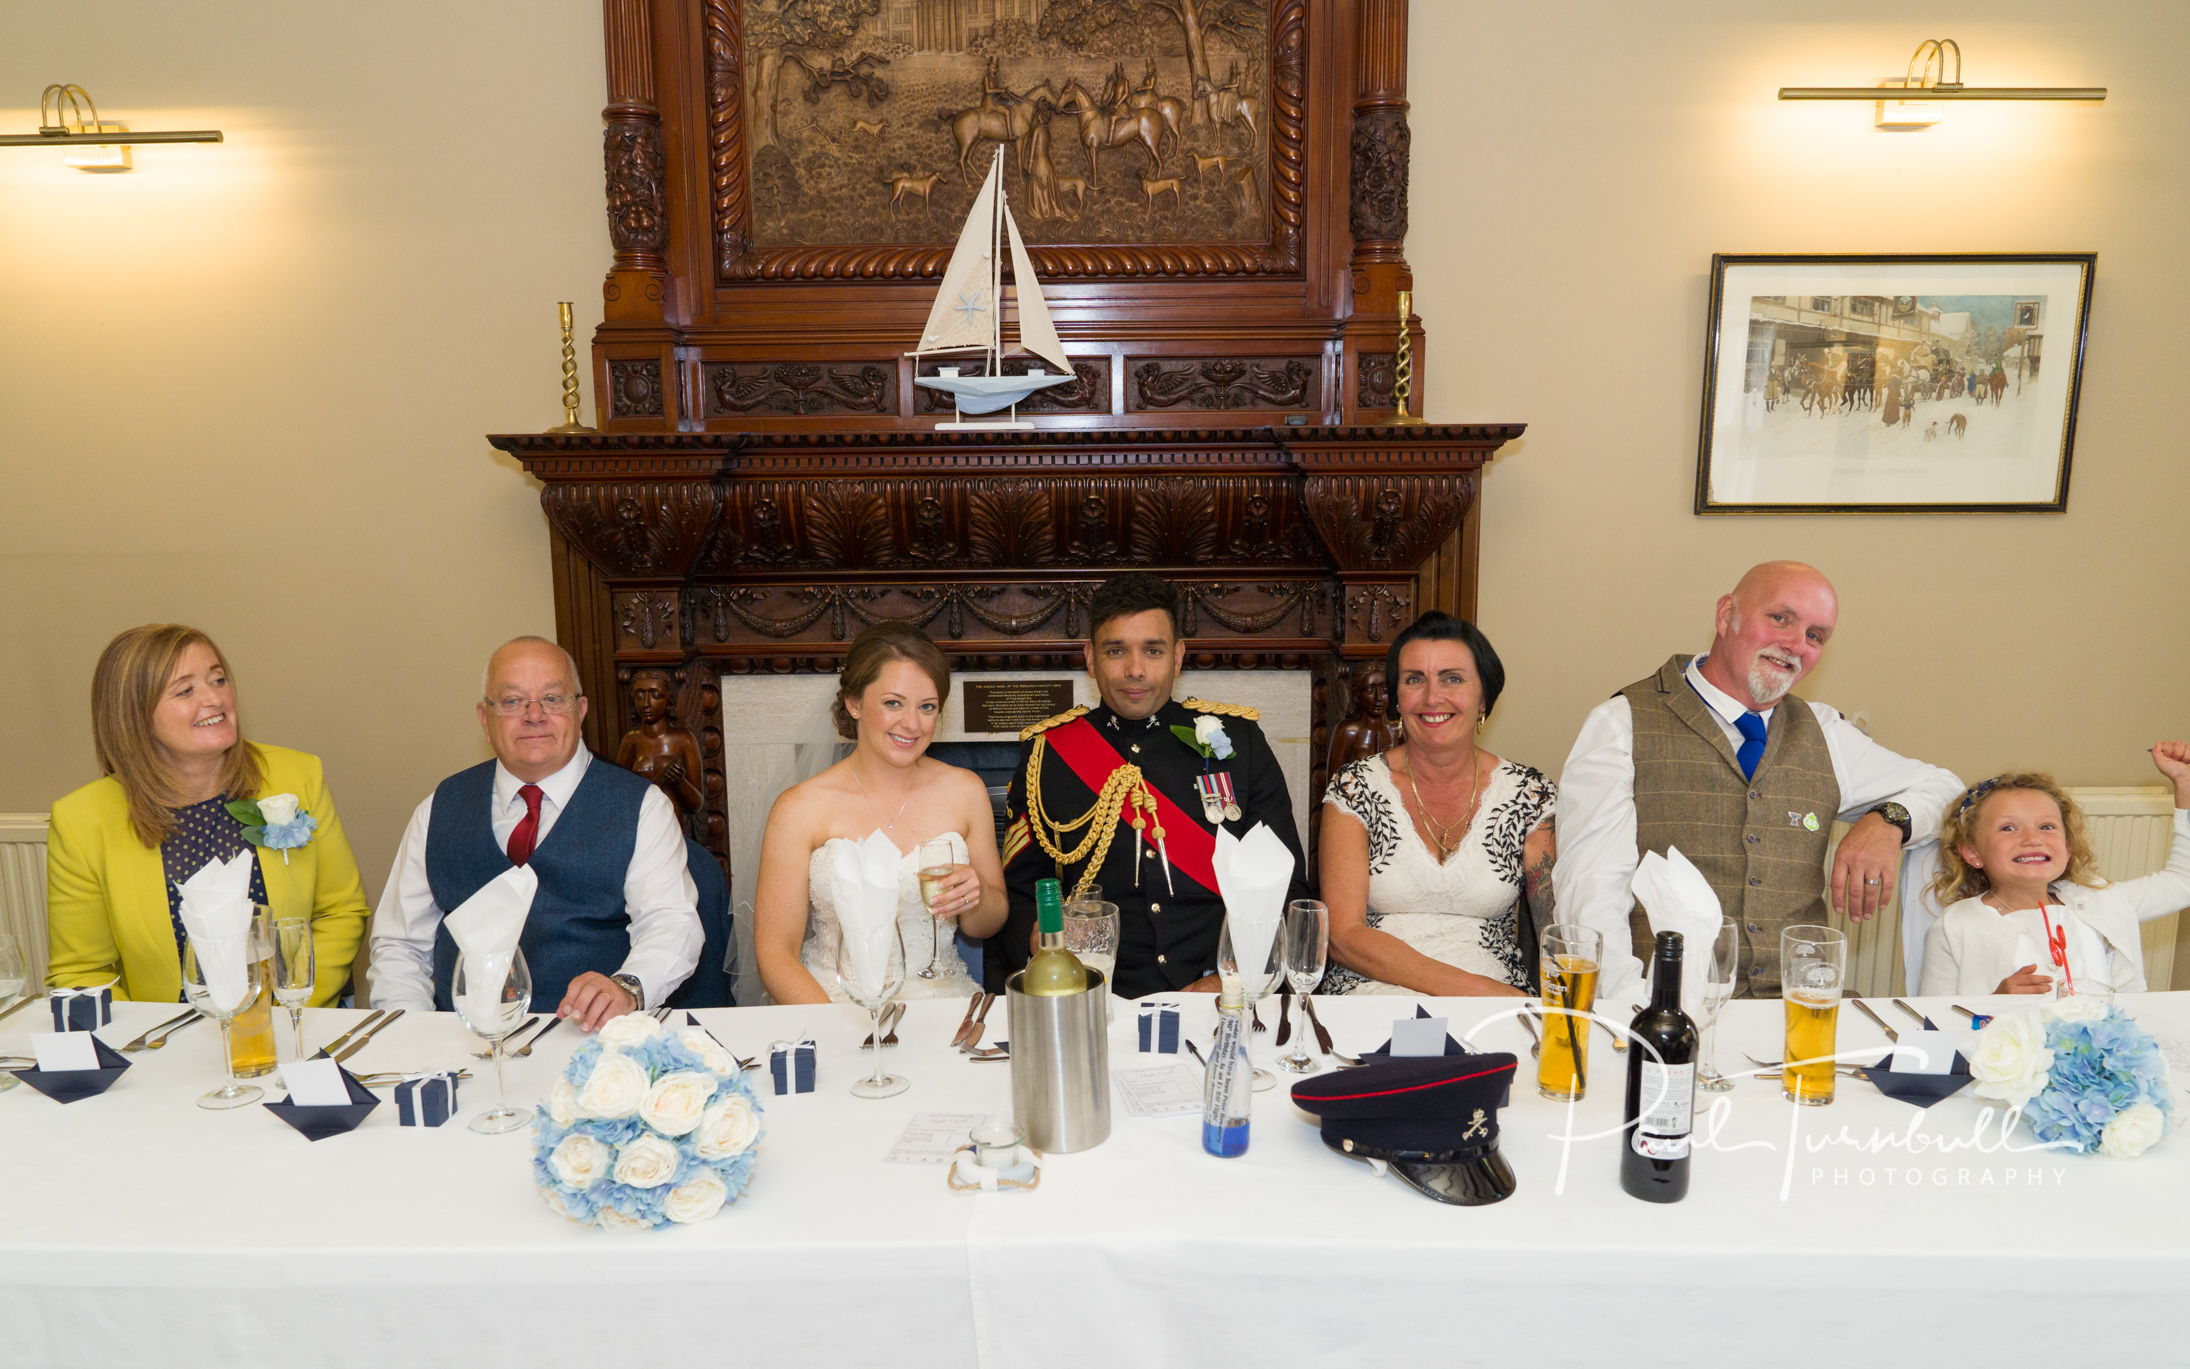 wedding-photographer-south-dalton-walkington-yorkshire-emma-james-056.jpg